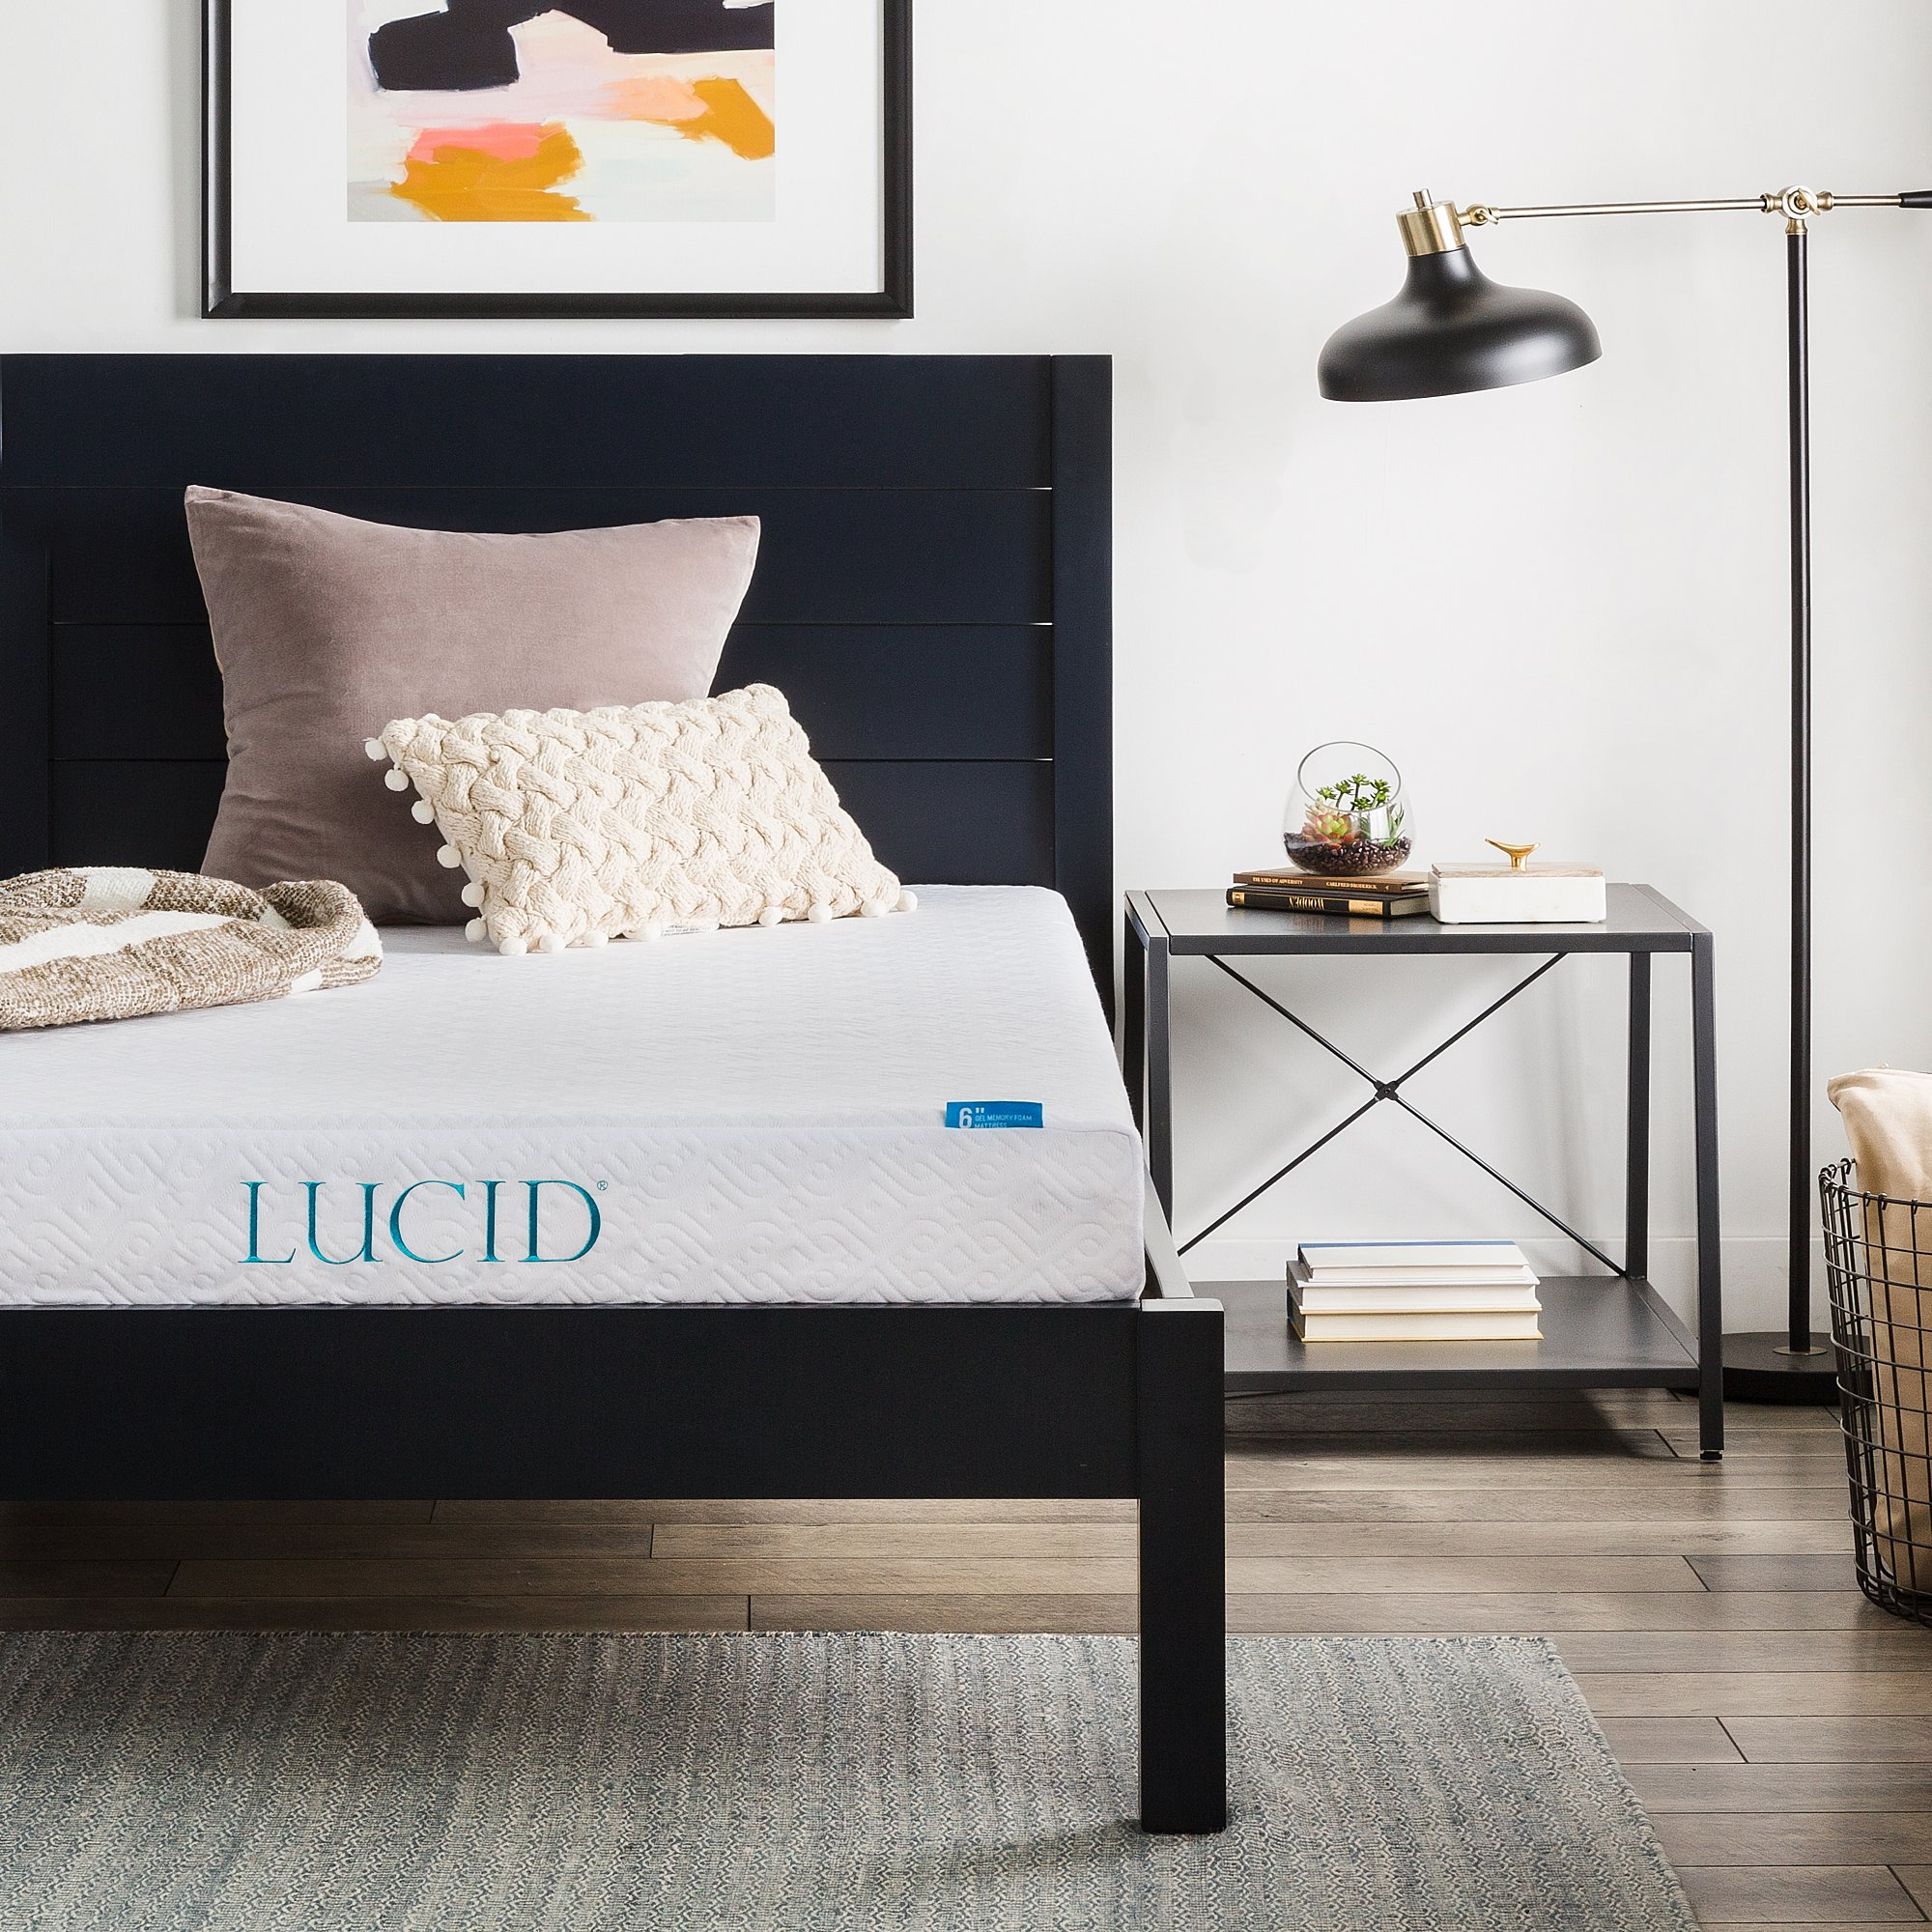 LUCID 6 Inch Gel Infused Memory Foam Mattress - Firm Feel - Perfect for Children - CertiPUR-US Certified - 10 Year warranty - Full